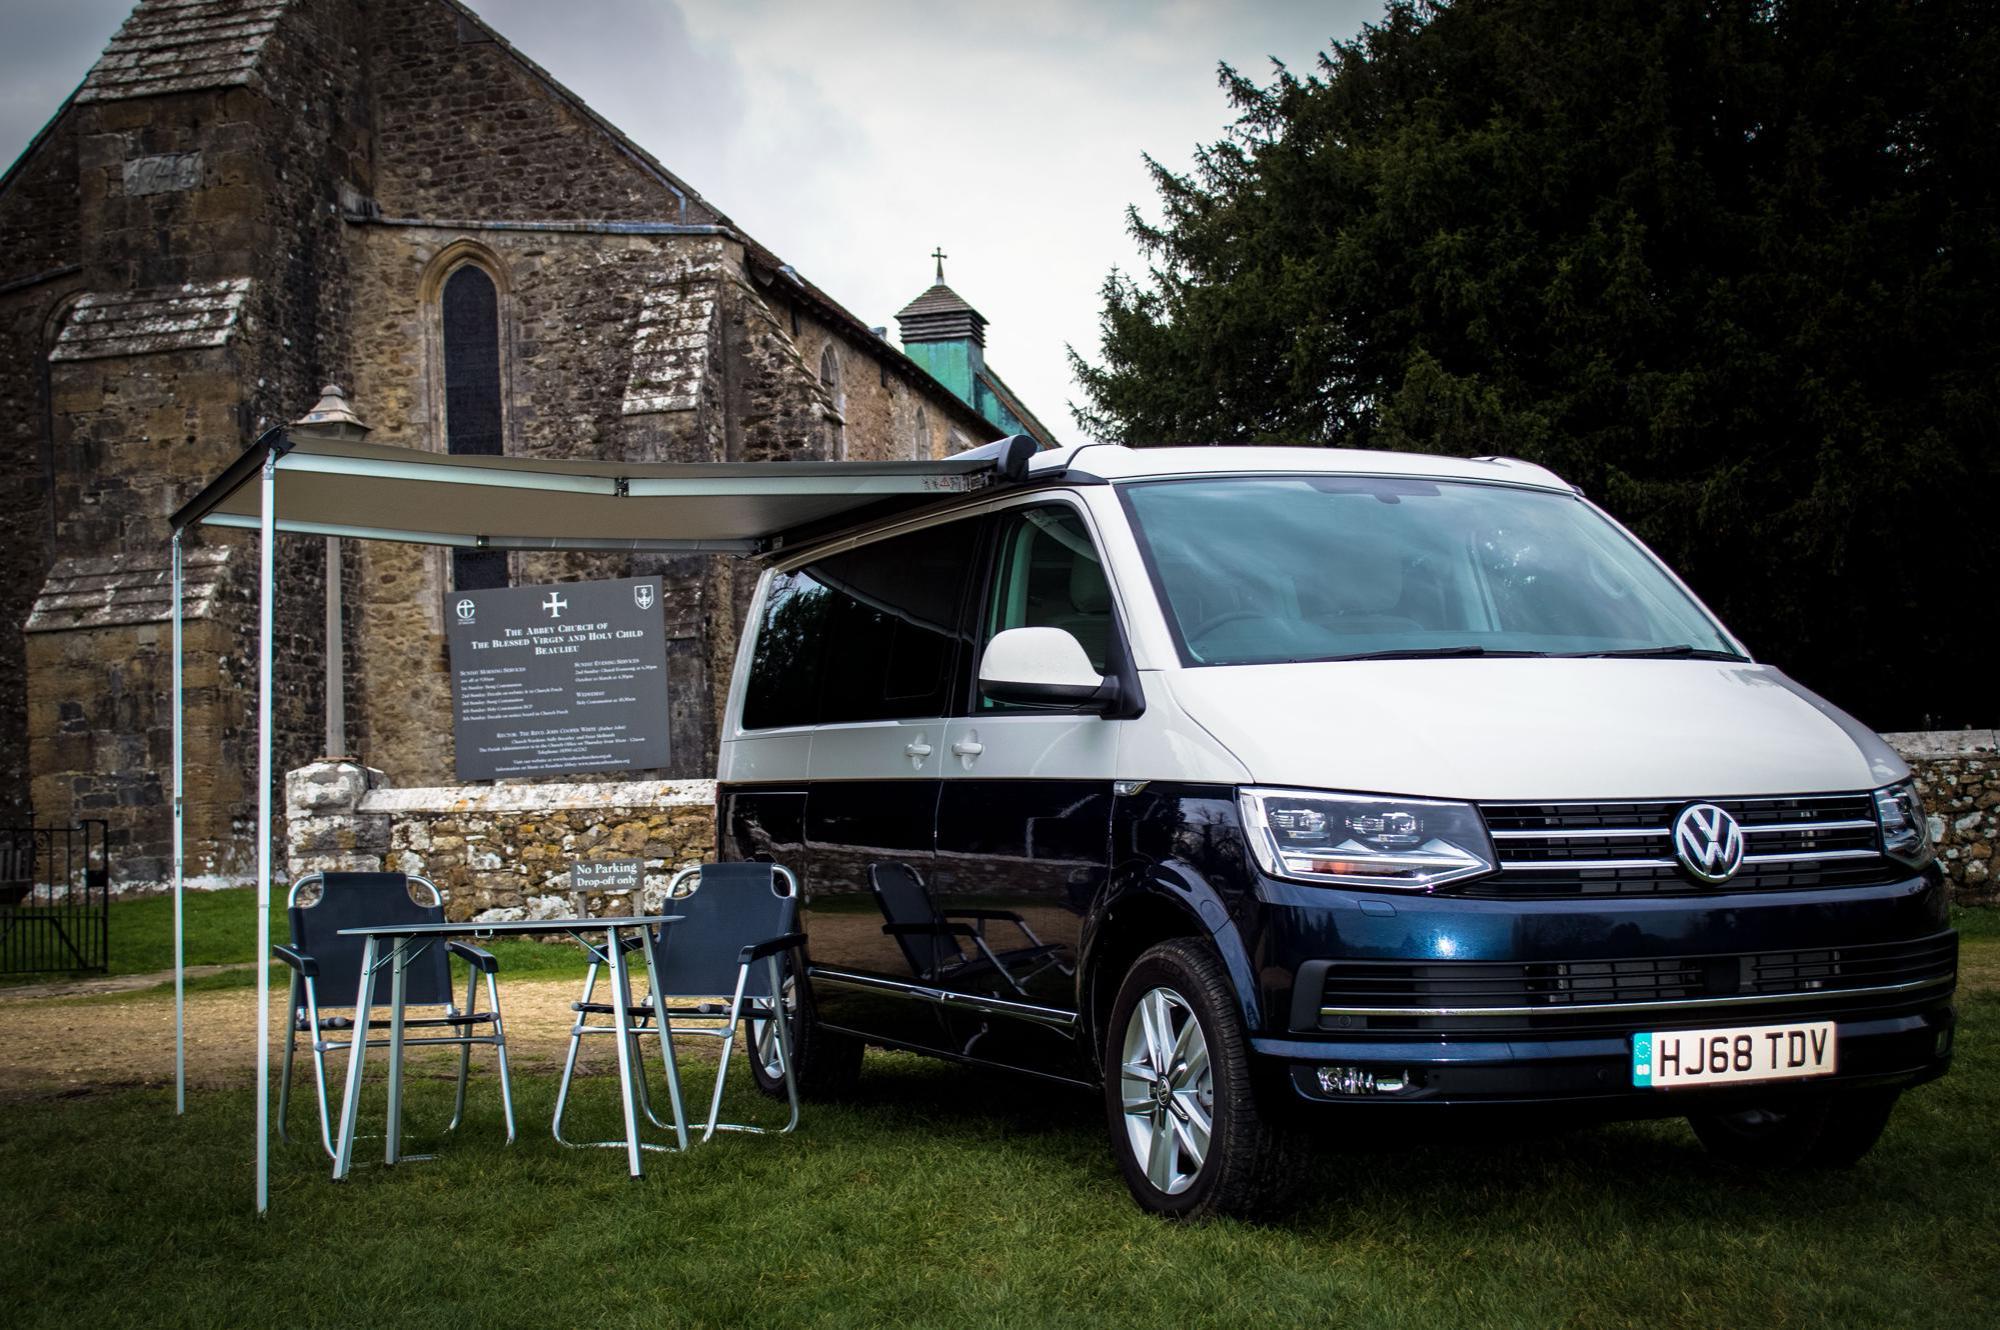 Campervan Hire in Southampton   Motorhome Rental in Southampton